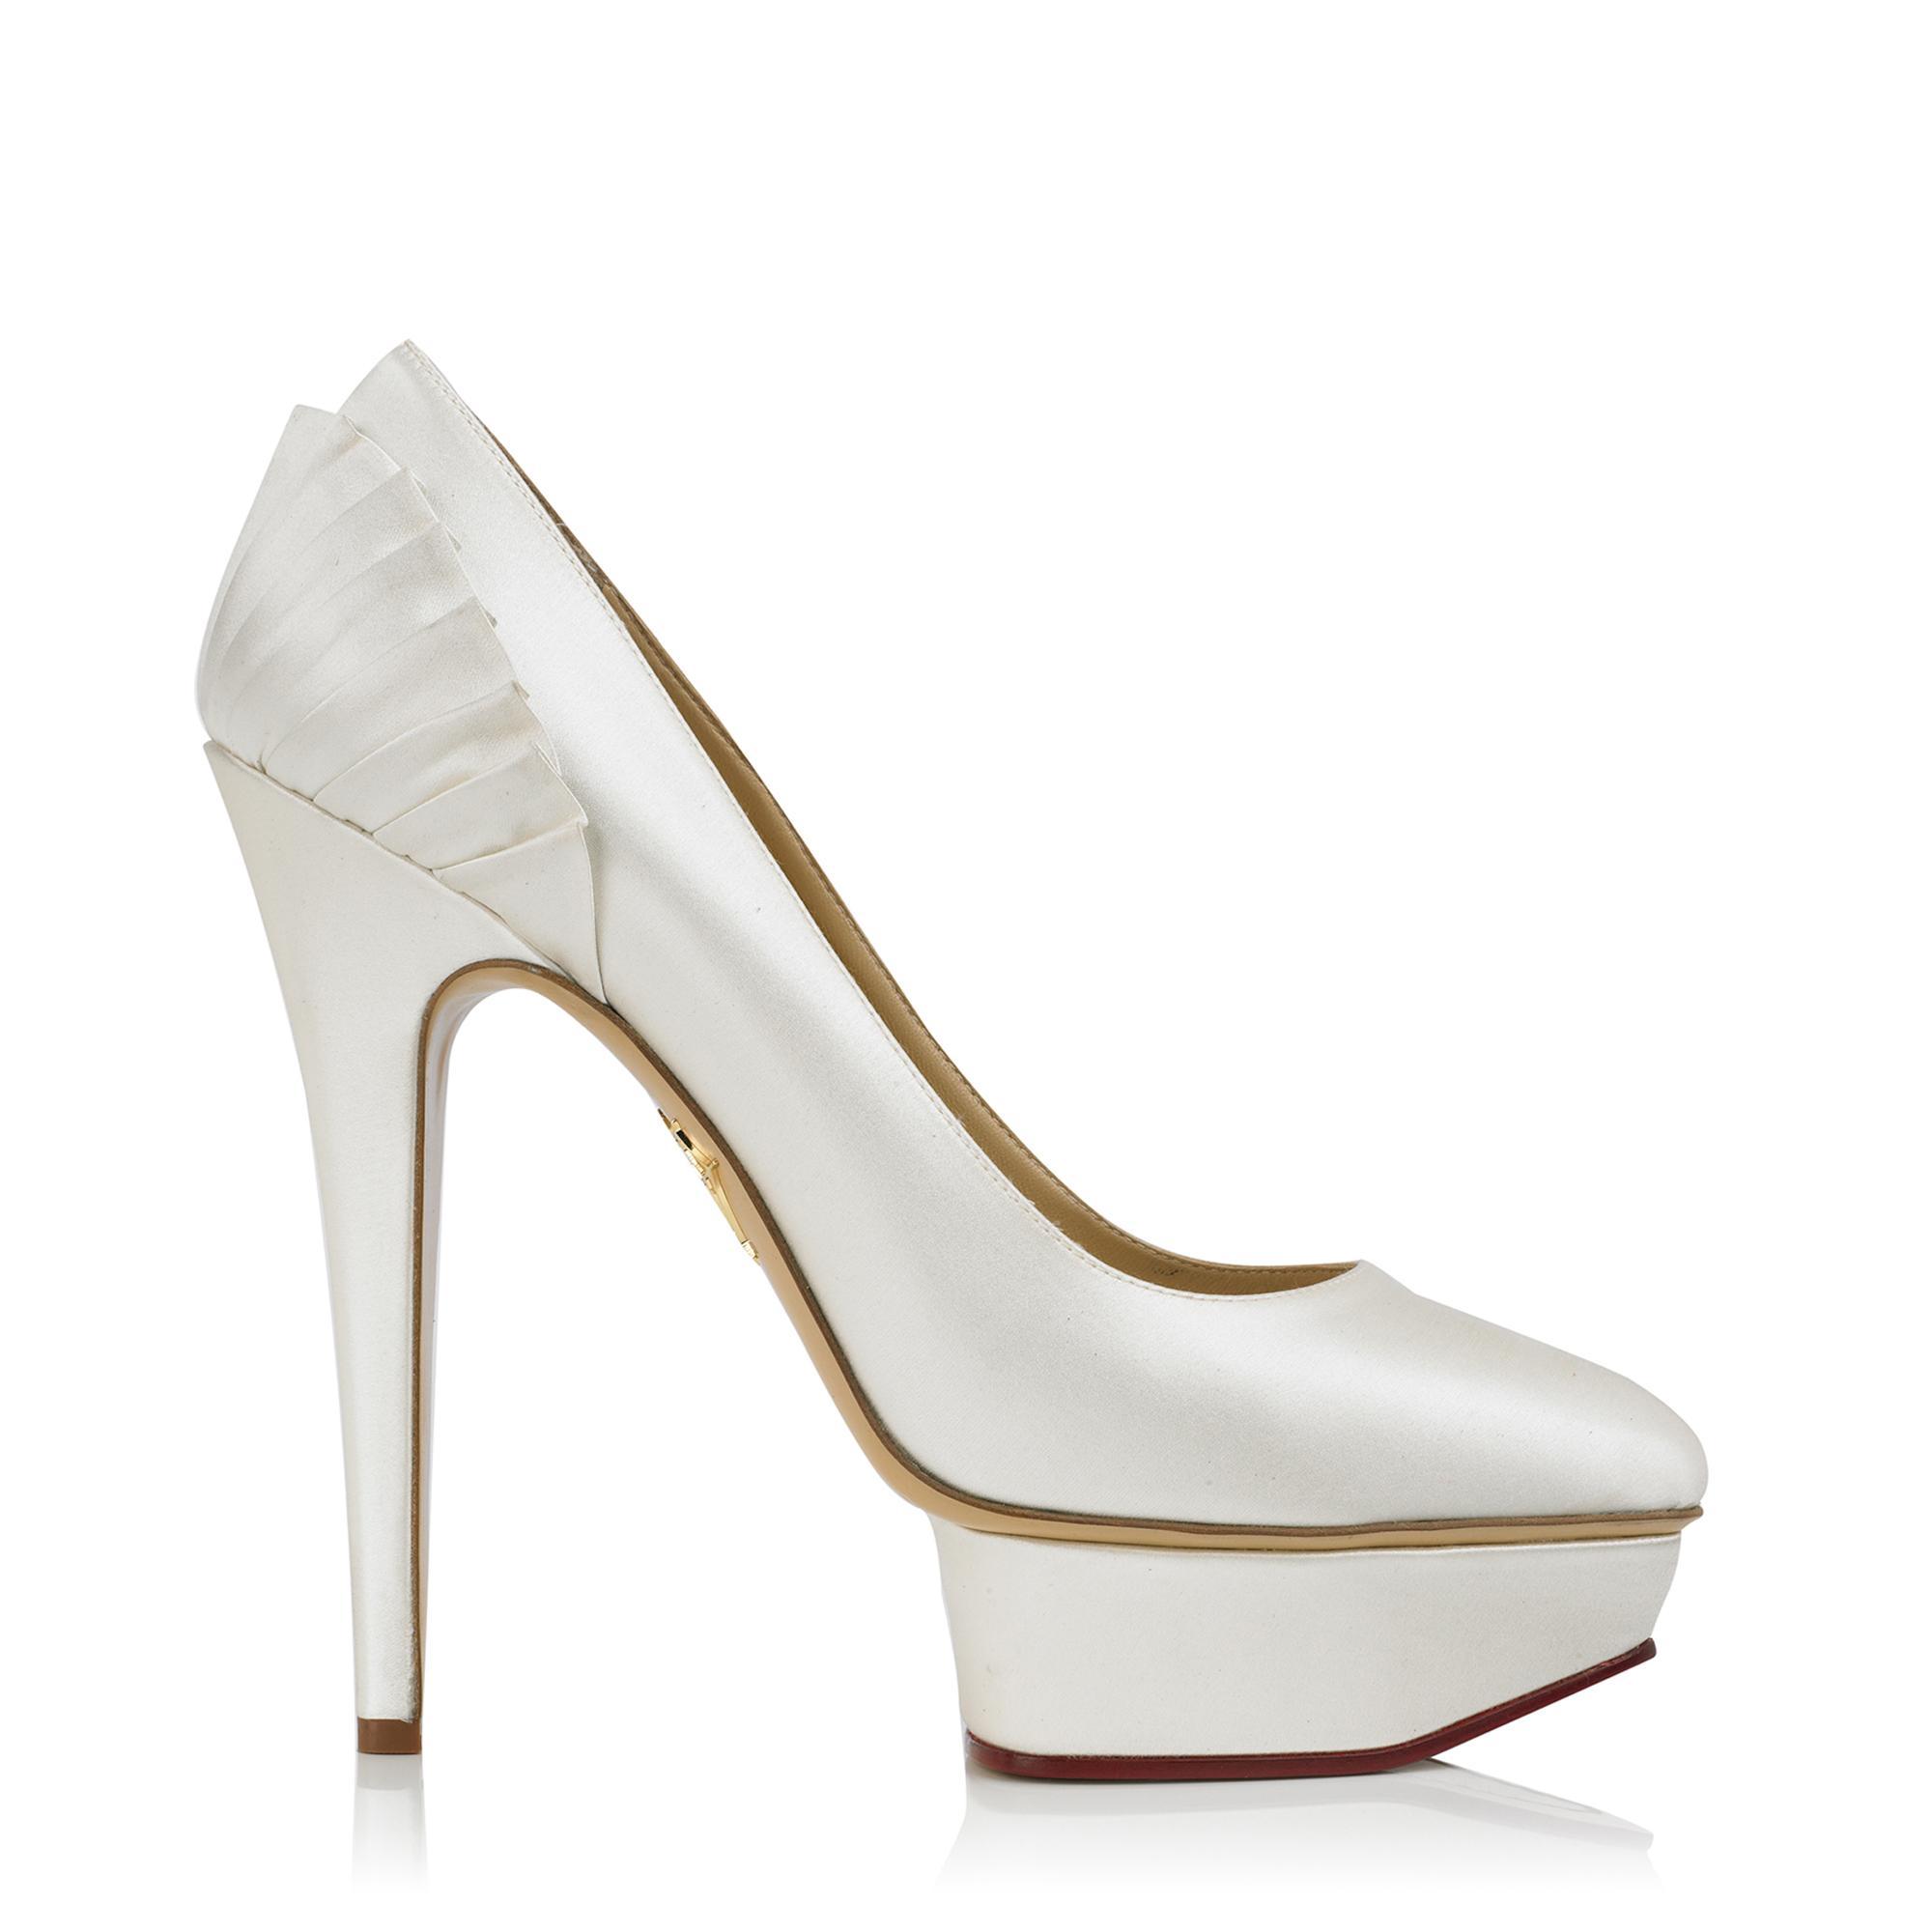 Luxury designer shoes & handbags